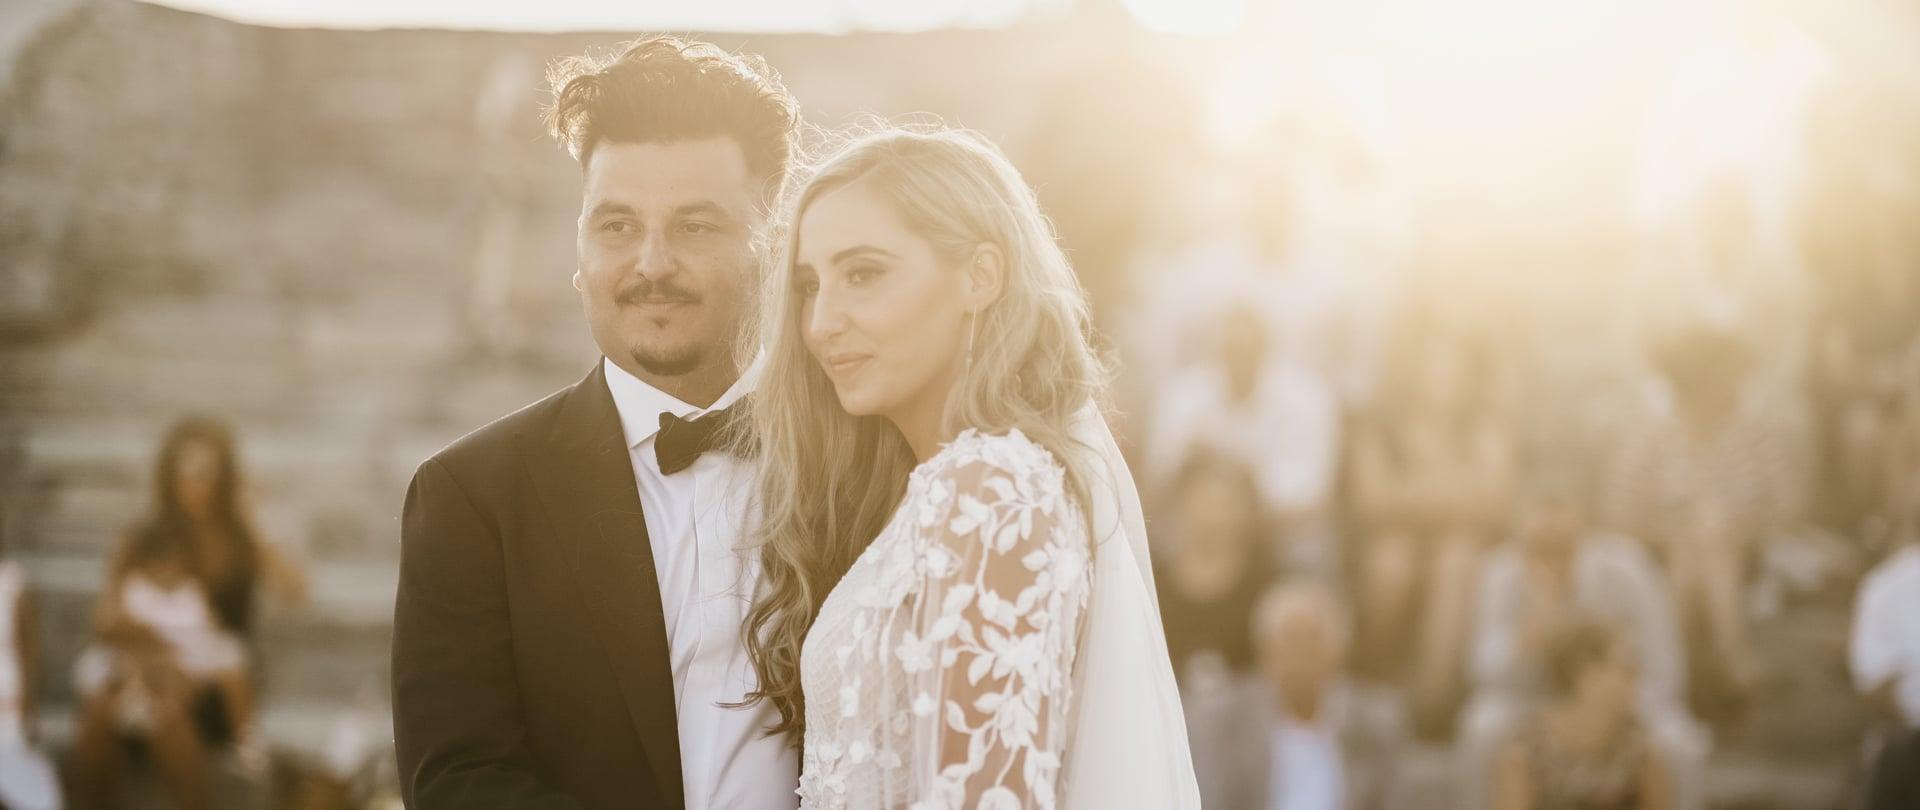 Natasha & Leon Wedding Video Filmed at Paros, Greece